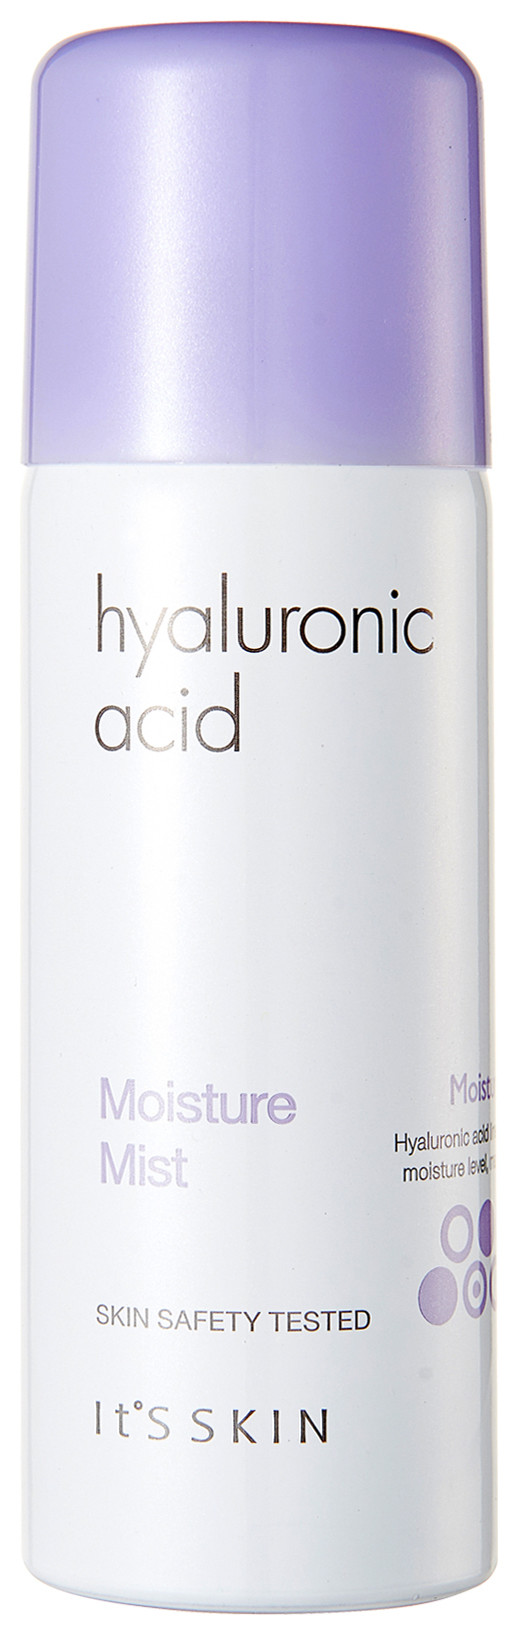 Мист увлажняющий с гиалуроновой кислотой Hyaluronic acid Moisture Mist It's Skin Hyaluronic acid